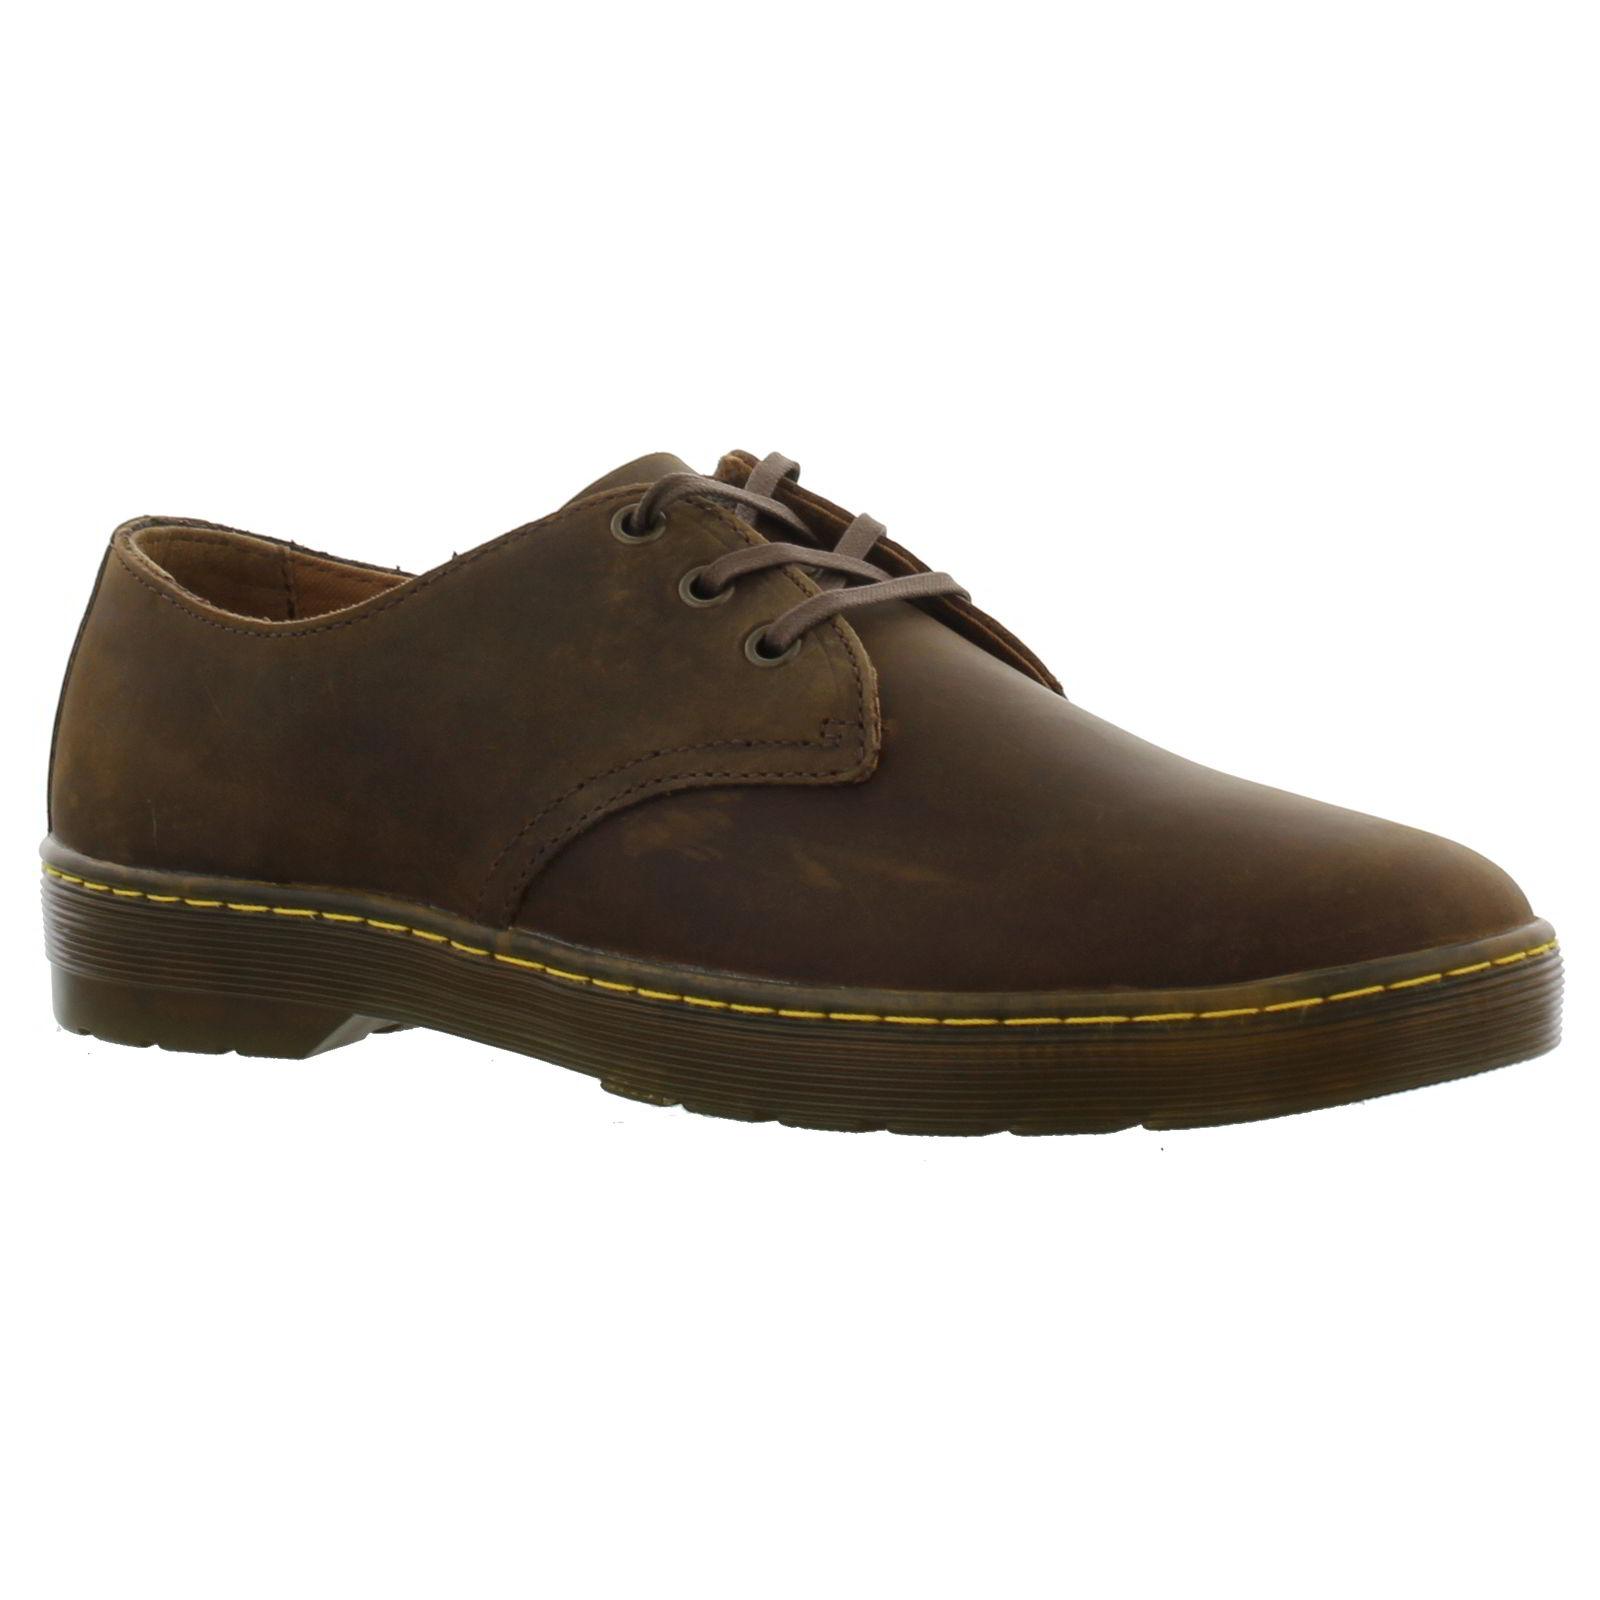 Dr Martens Mens Coronado Leather Shoes